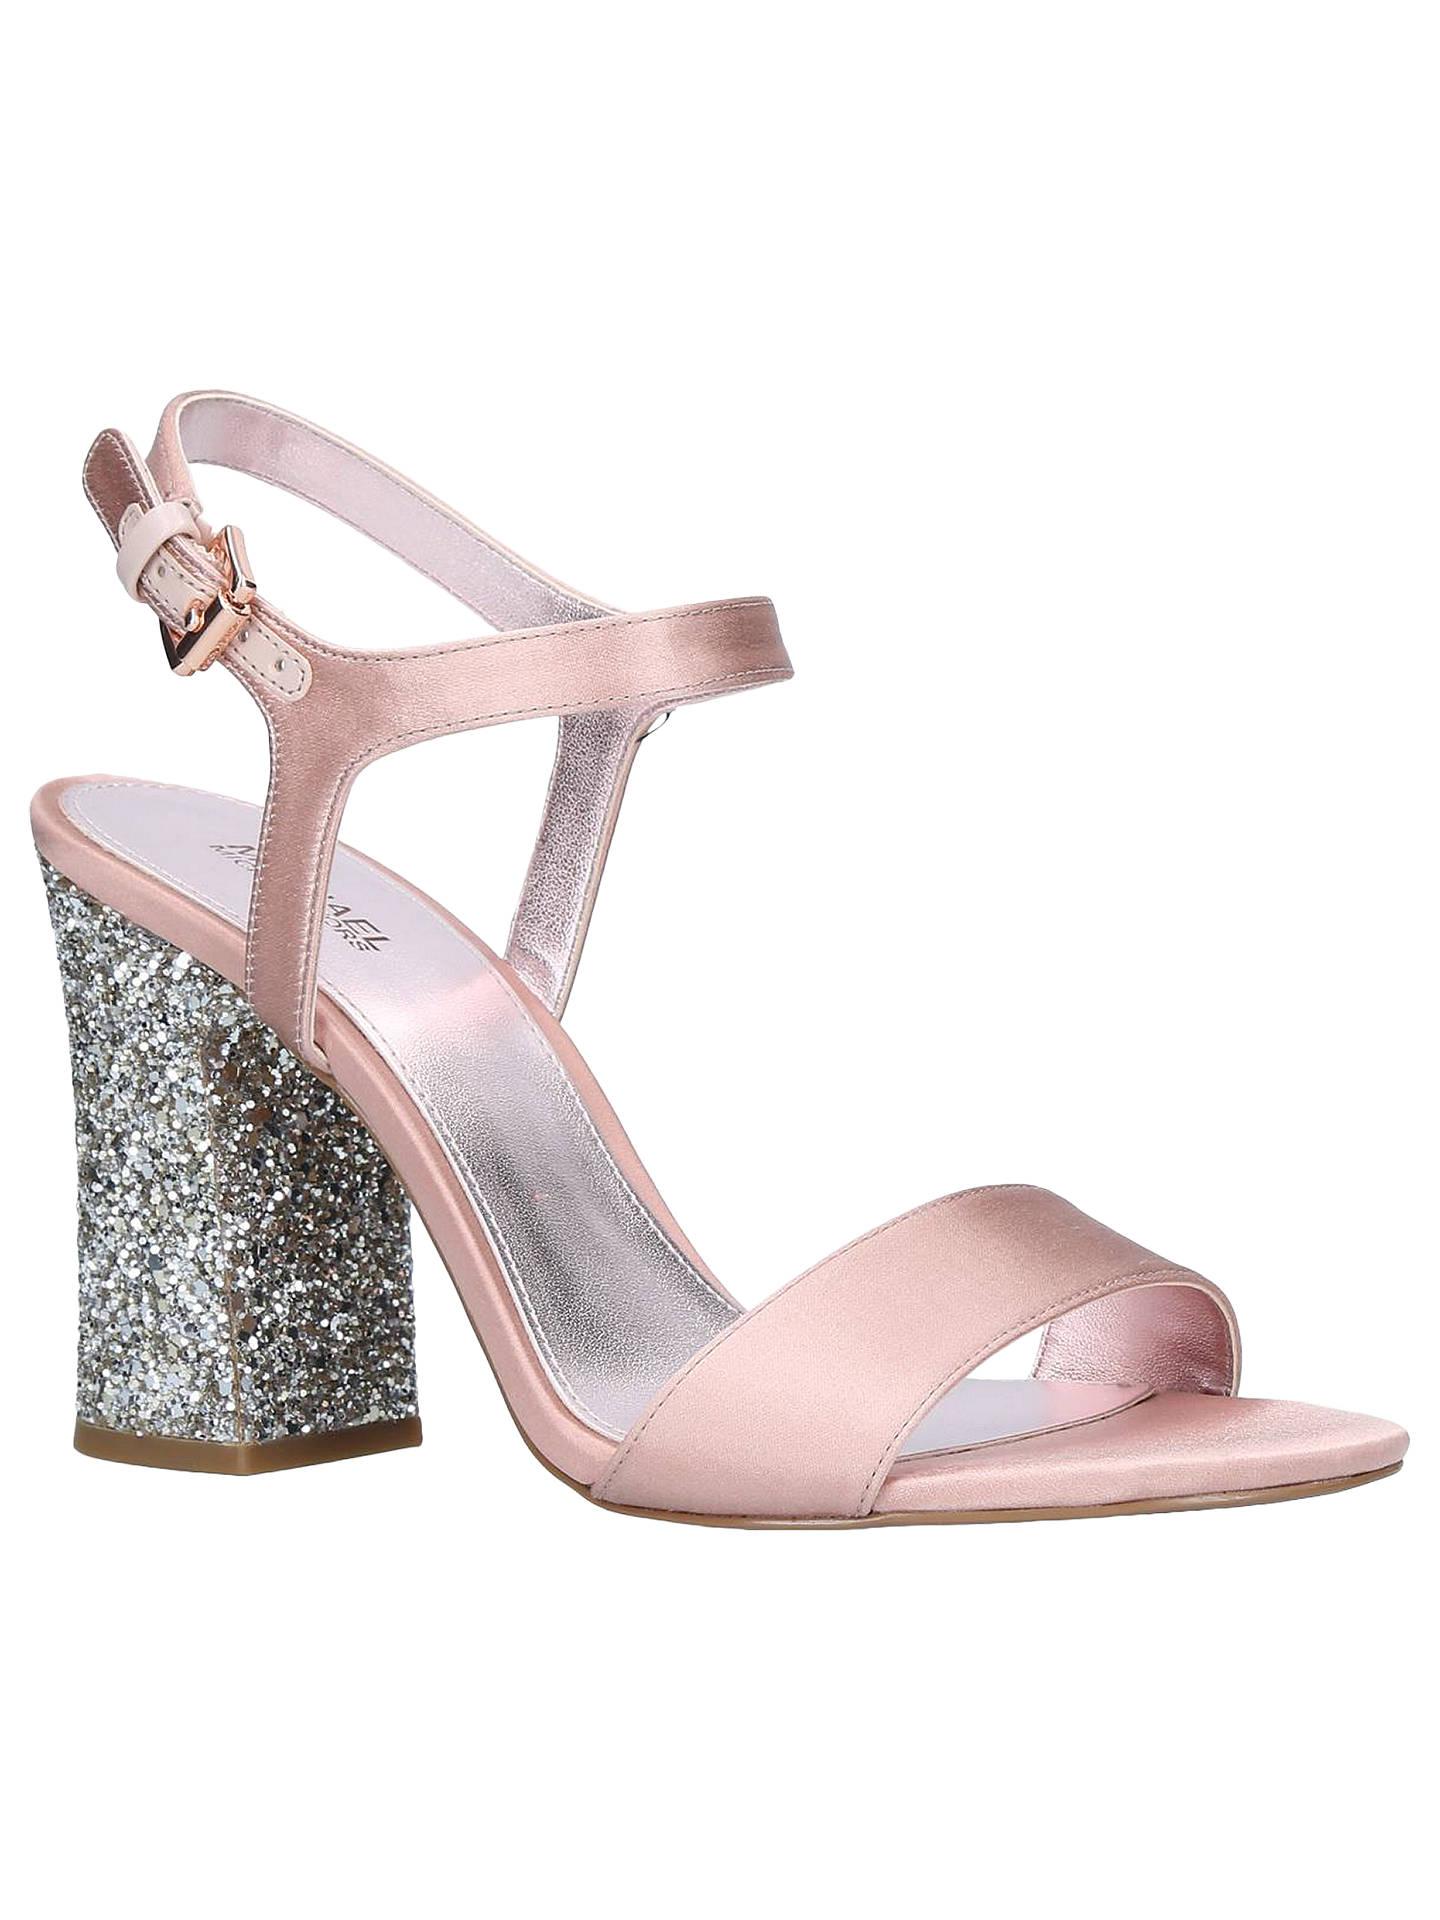 b425b24cb Buy MICHAEL Michael Kors Tori Block Heel Sandals, Pale Pink, 3 Online at  johnlewis ...